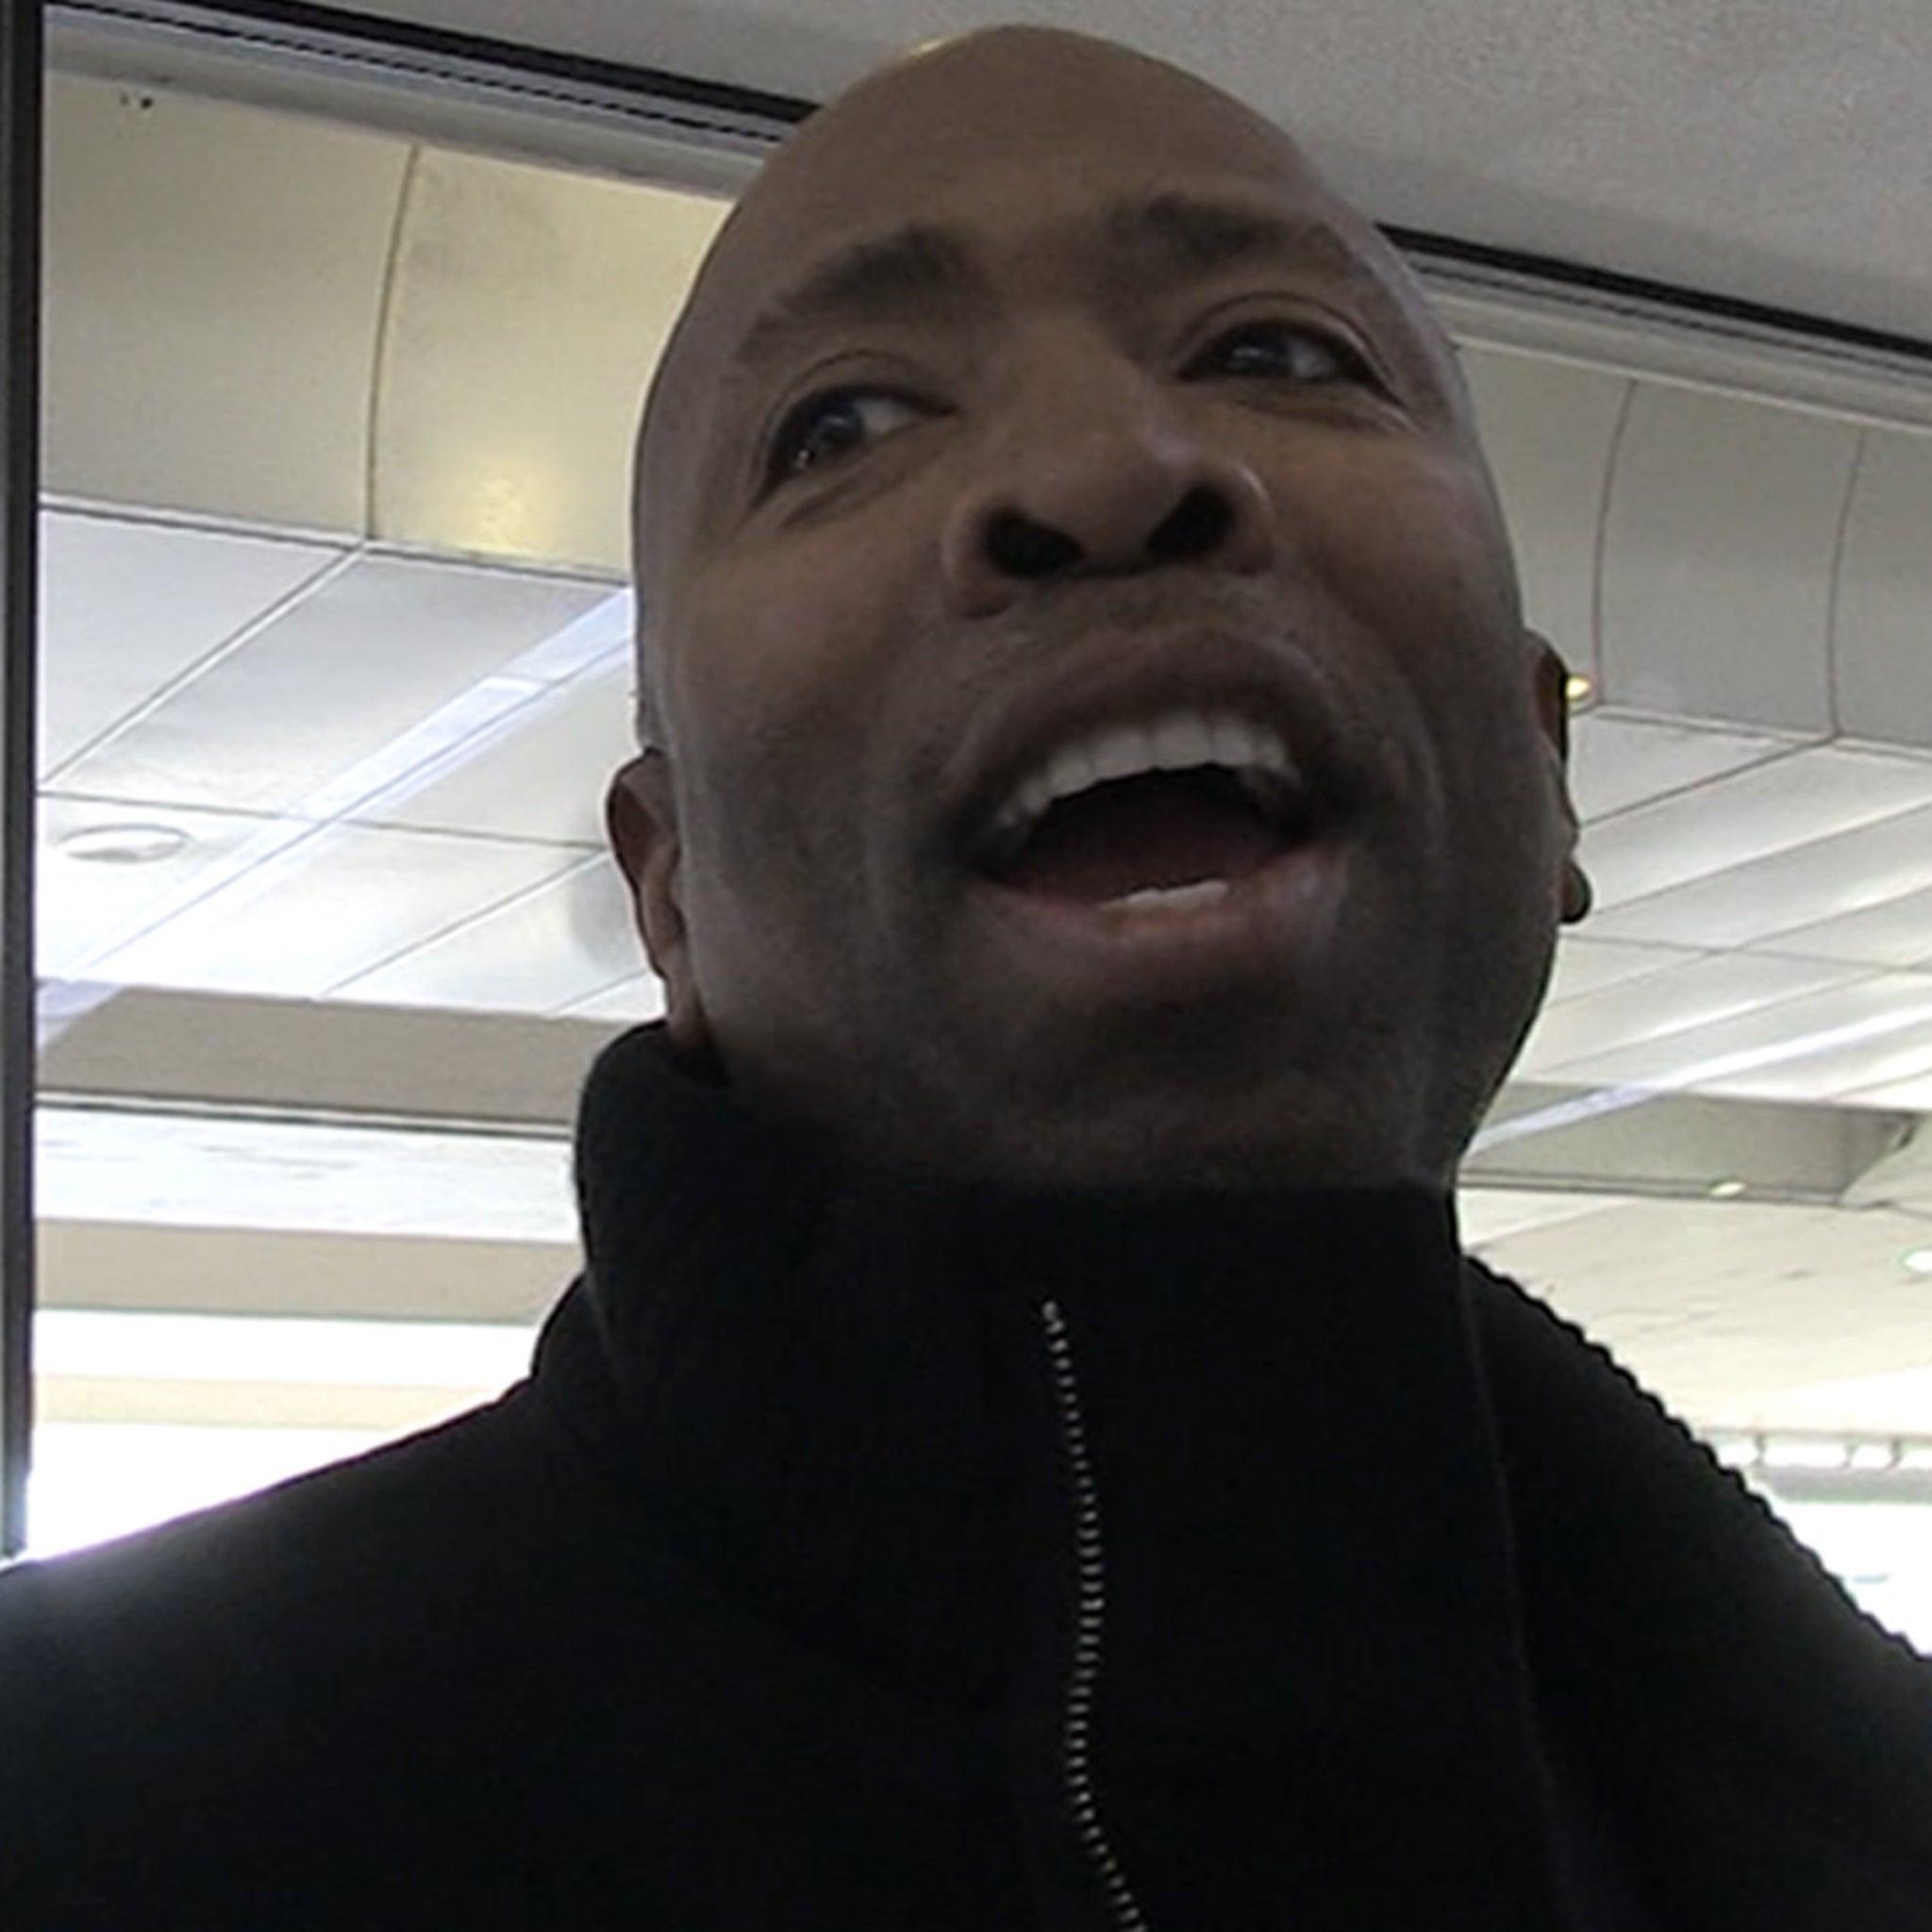 LeBron James' Pregame Powder Snub Was No Coincidence, Says Kenny Smith